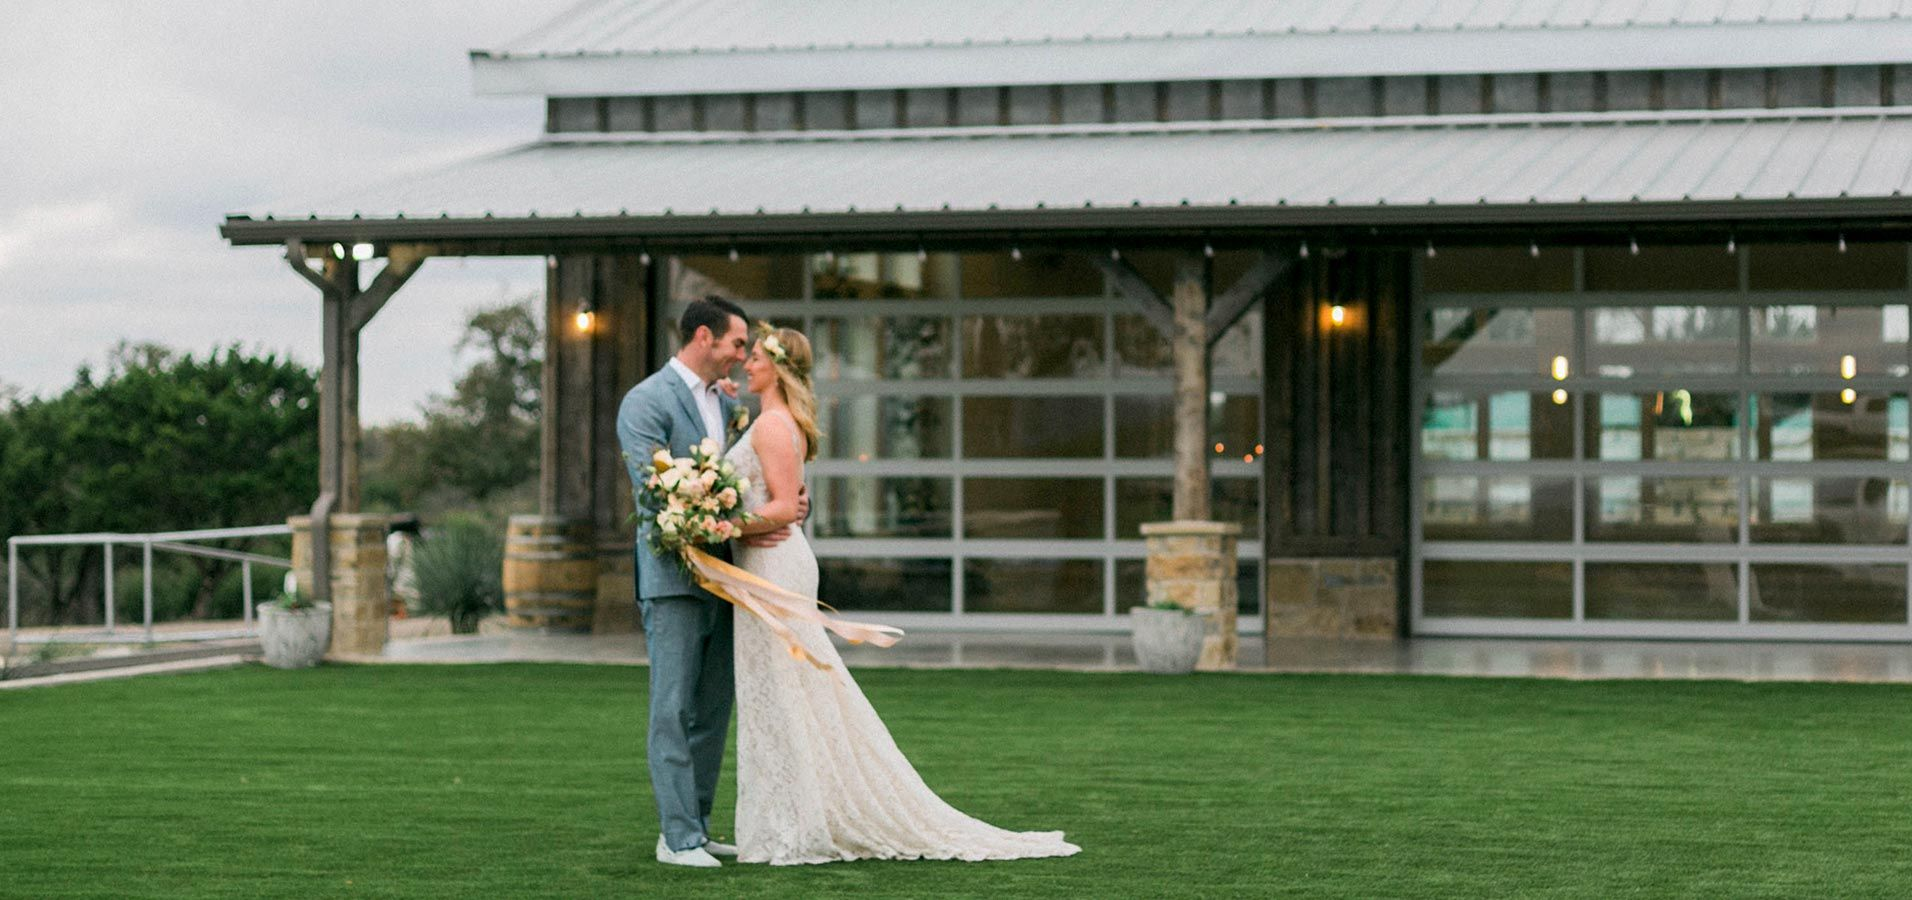 Brand new wedding venue in Fredericksburg, Texas.